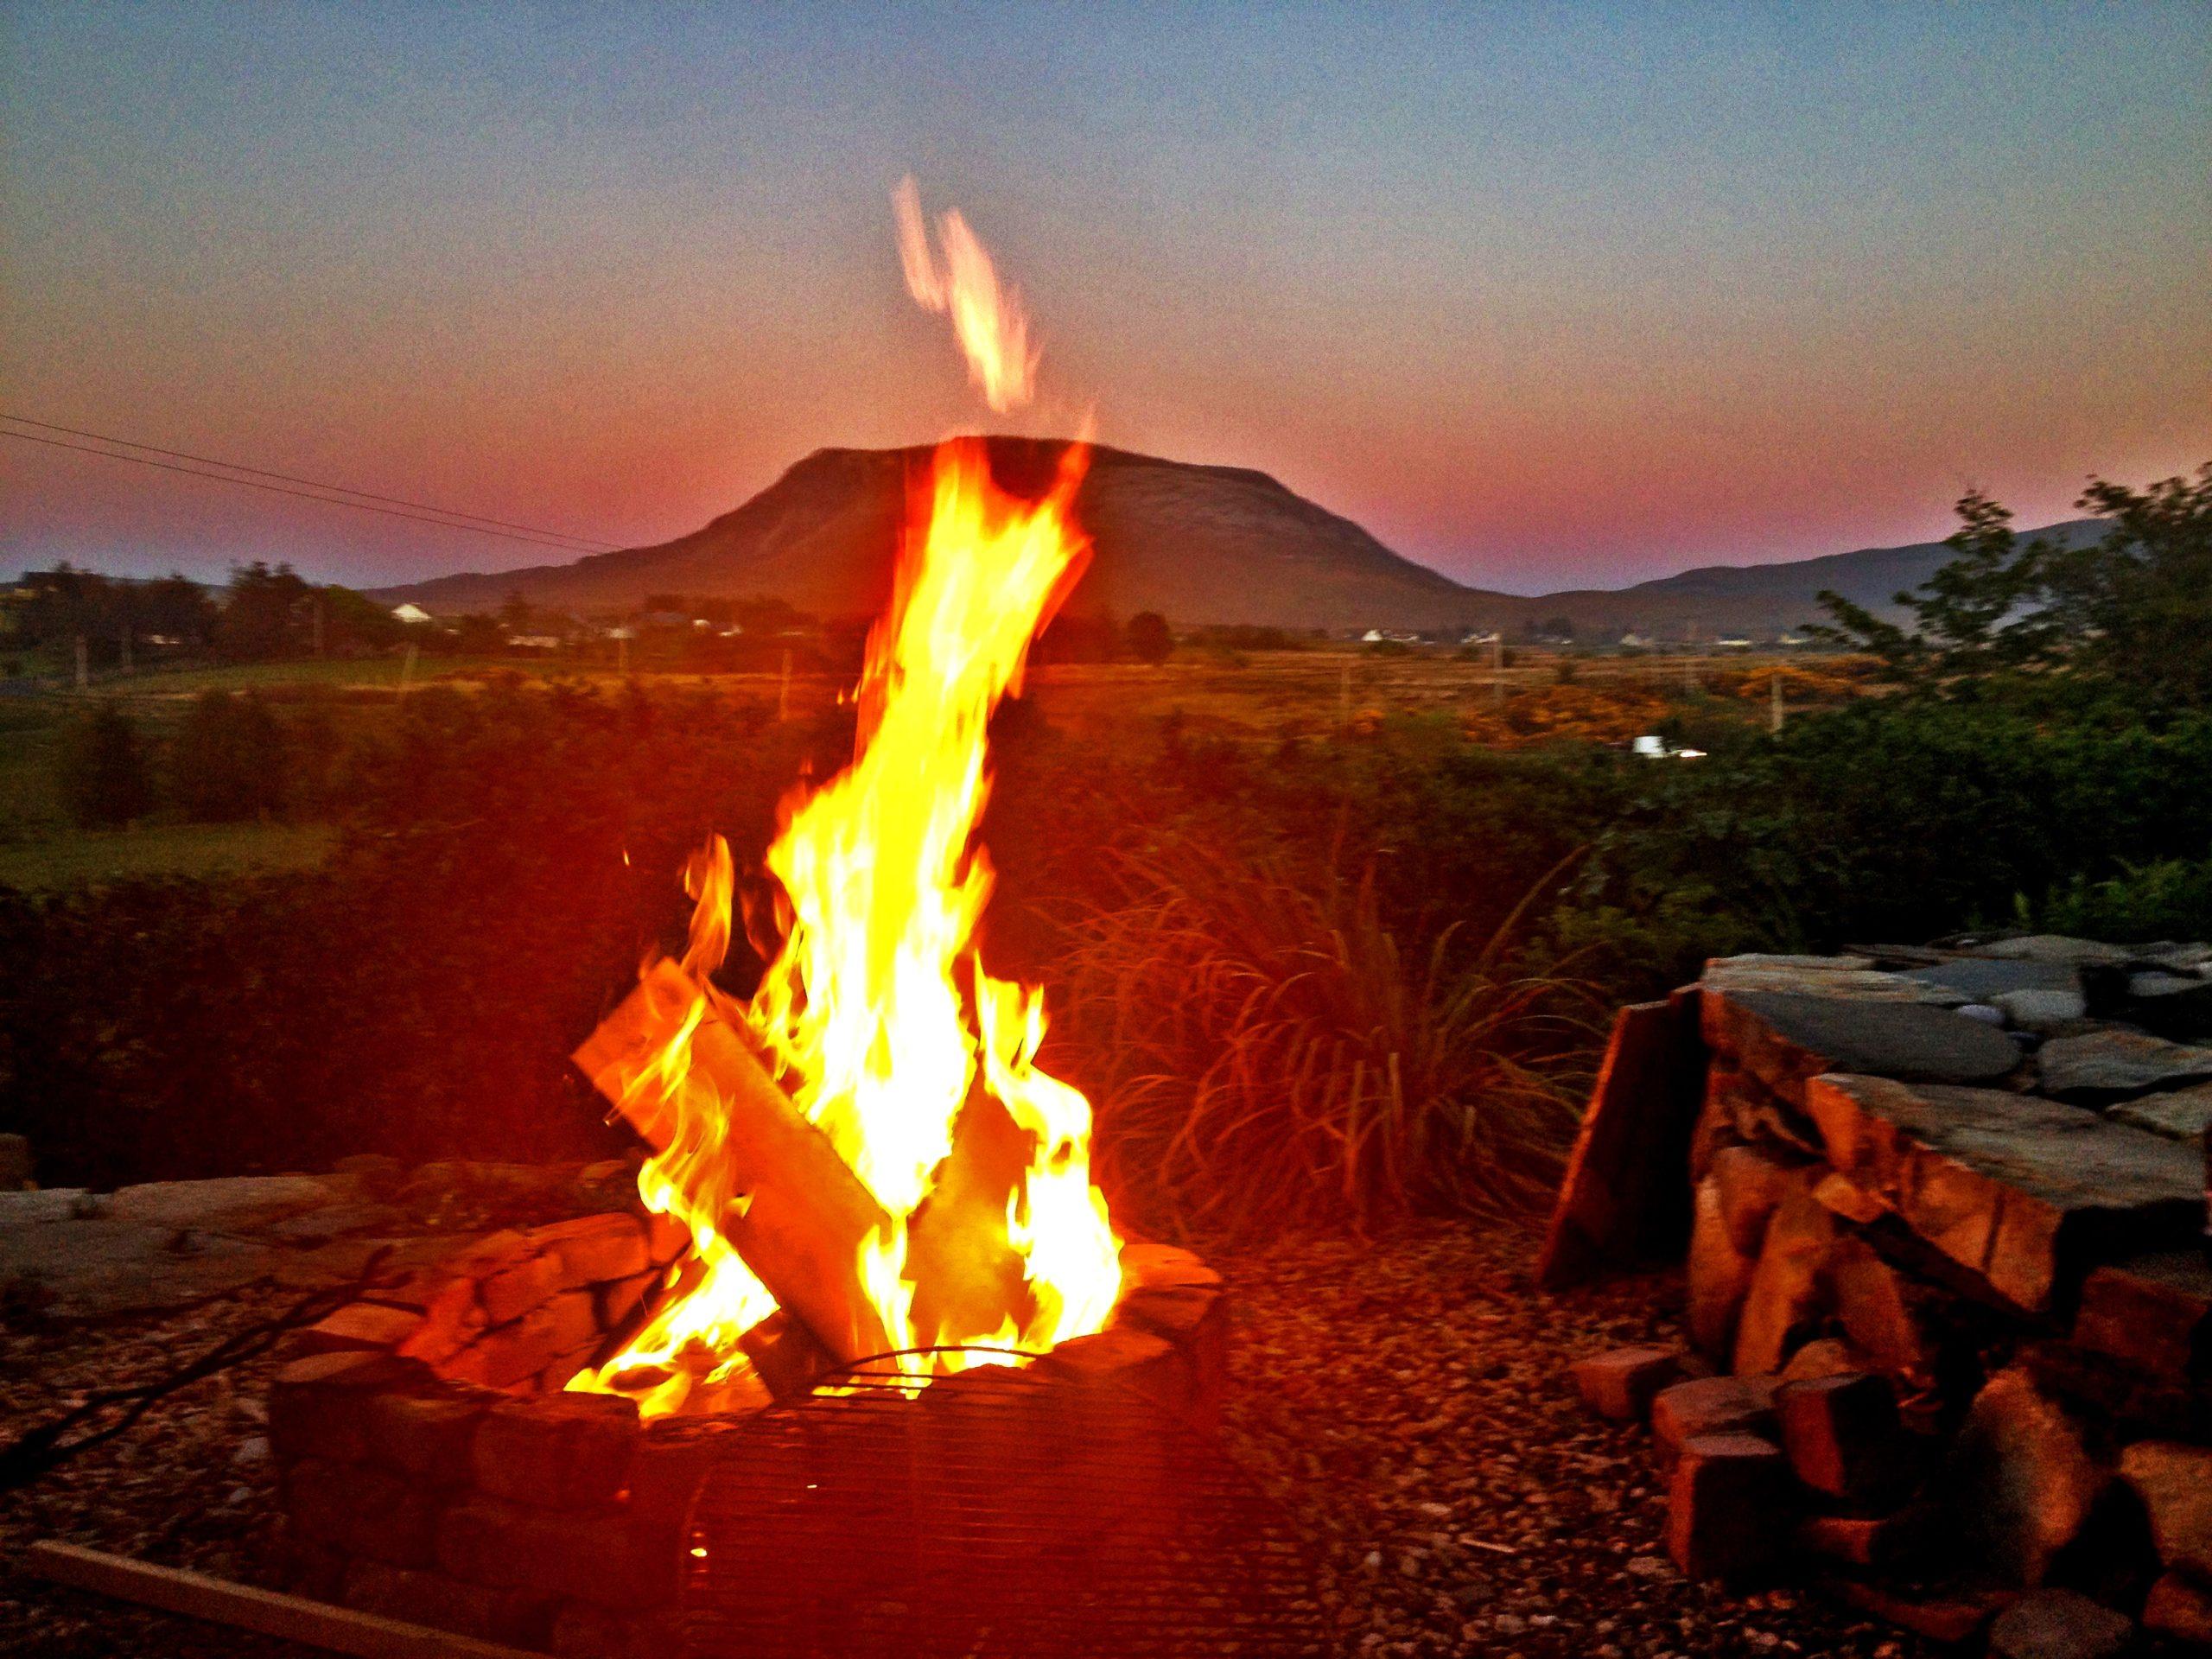 Muckish Mountain, Falcarragh, Co. Donegal